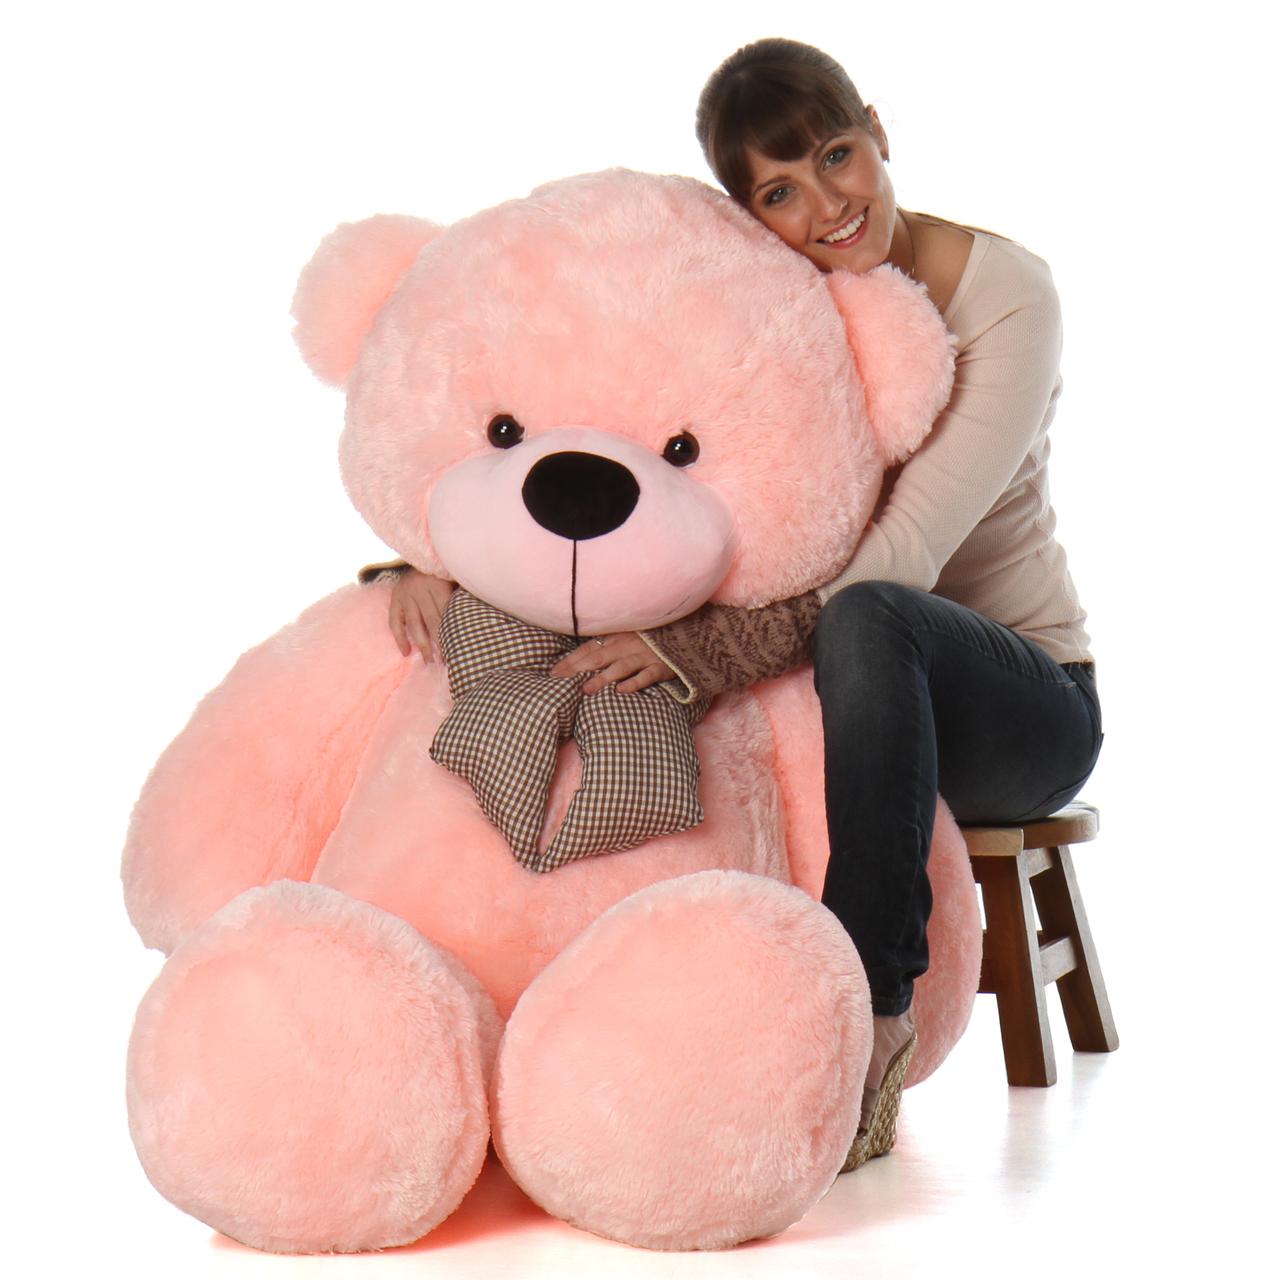 Hay Hay Chicken Stuffed Animal, Lady Cuddles 60 Pink Huge Stuffed Teddy Bear Giant Teddy Bears